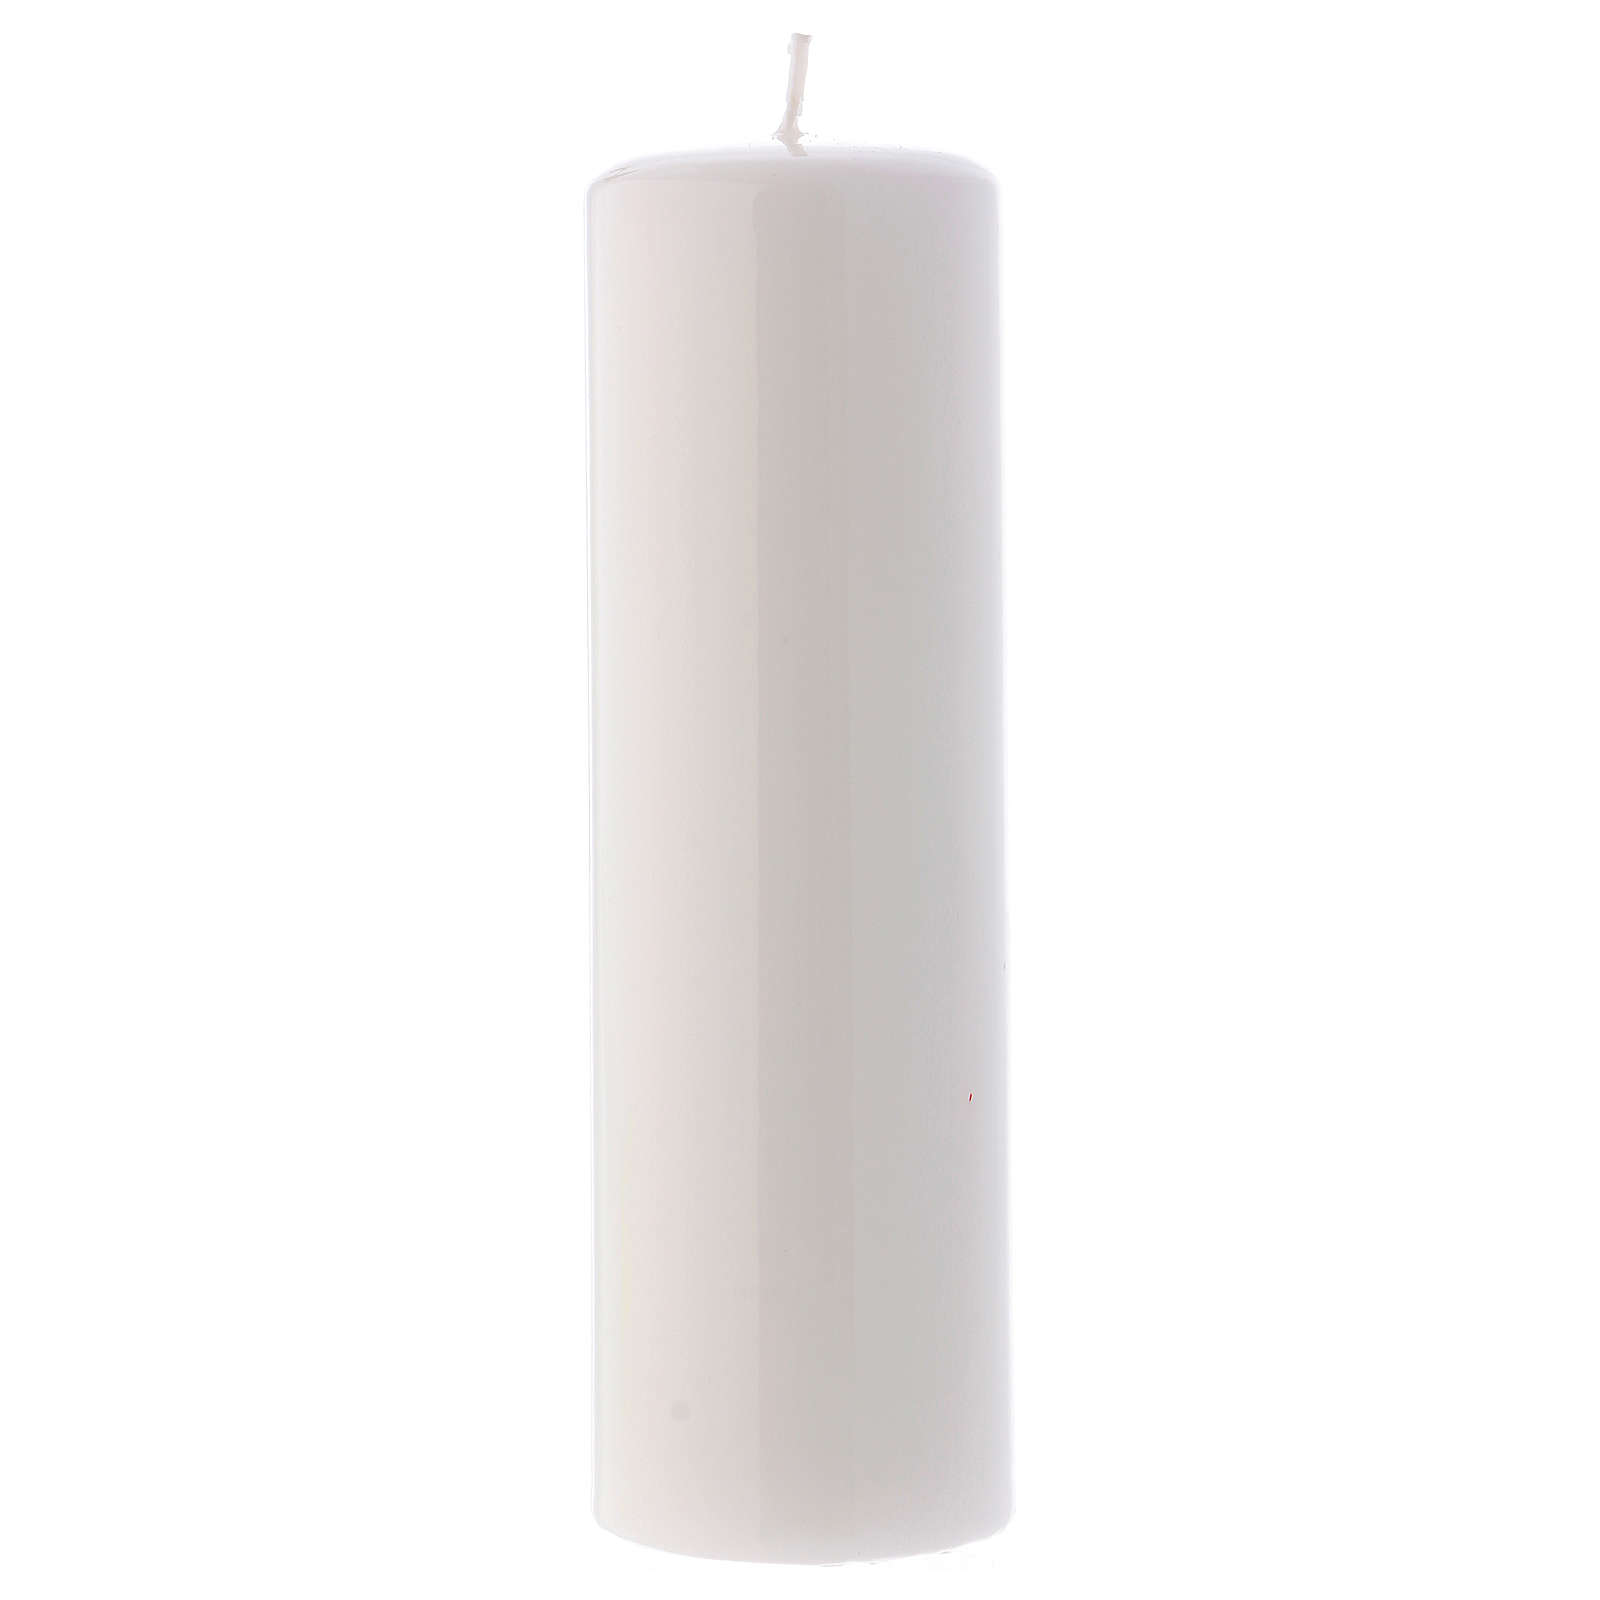 Bougie liturgique brillante Ceralacca 20x6 cm blanc 3